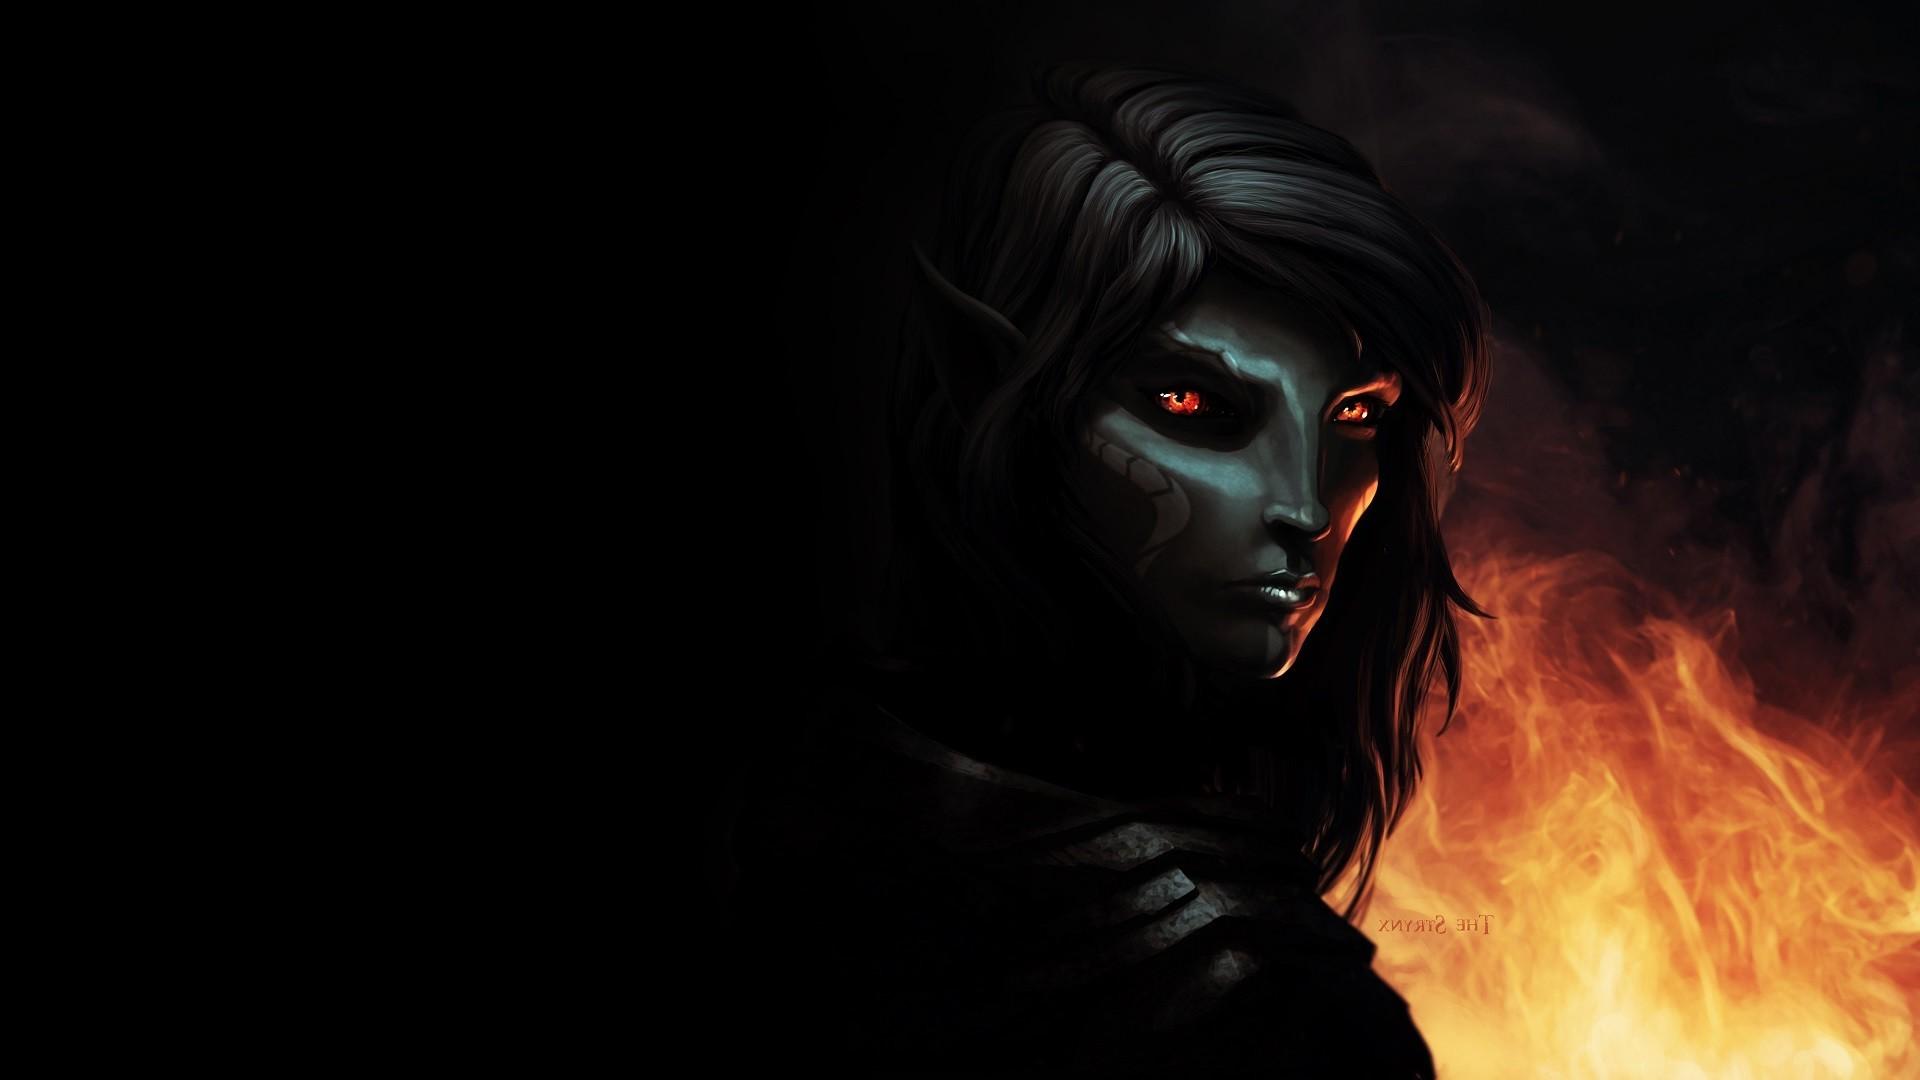 fantasy Art The Elder Scrolls V Skyrim Dark Elf Fire 1920x1080